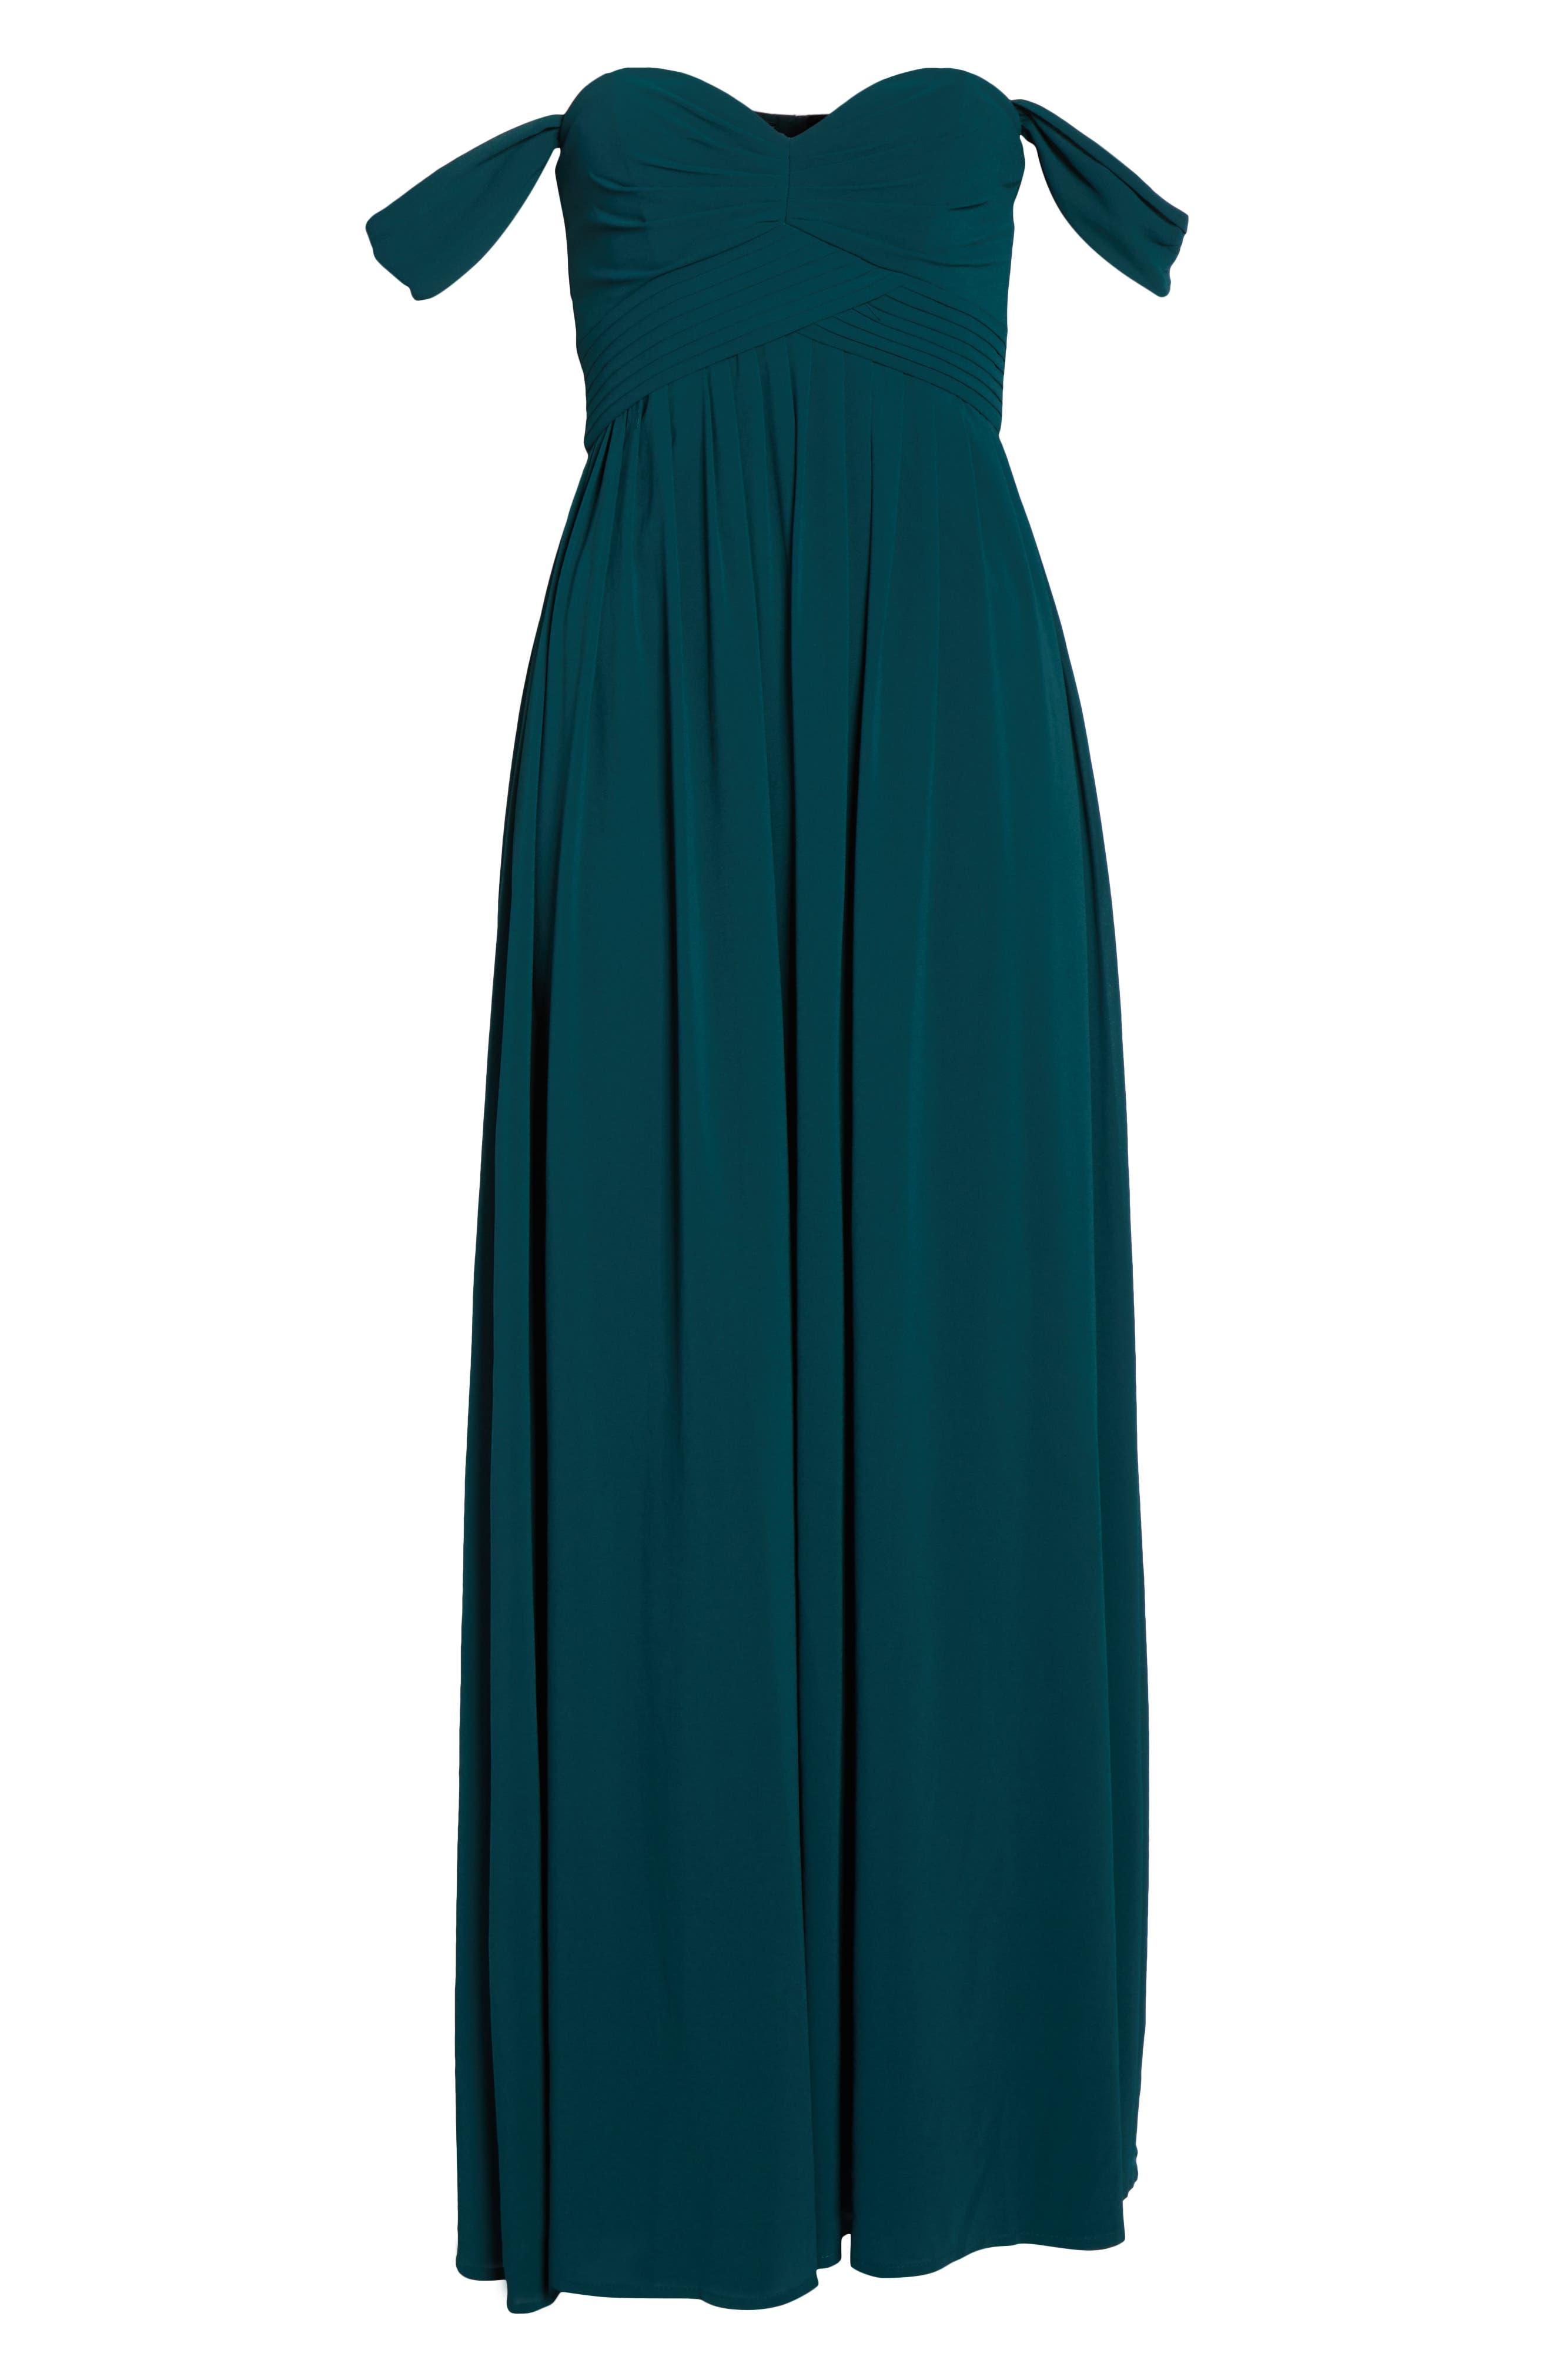 LULUS, Convertible Neckline Chiffon Gown, Alternate thumbnail 6, color, DEEP EMERALD